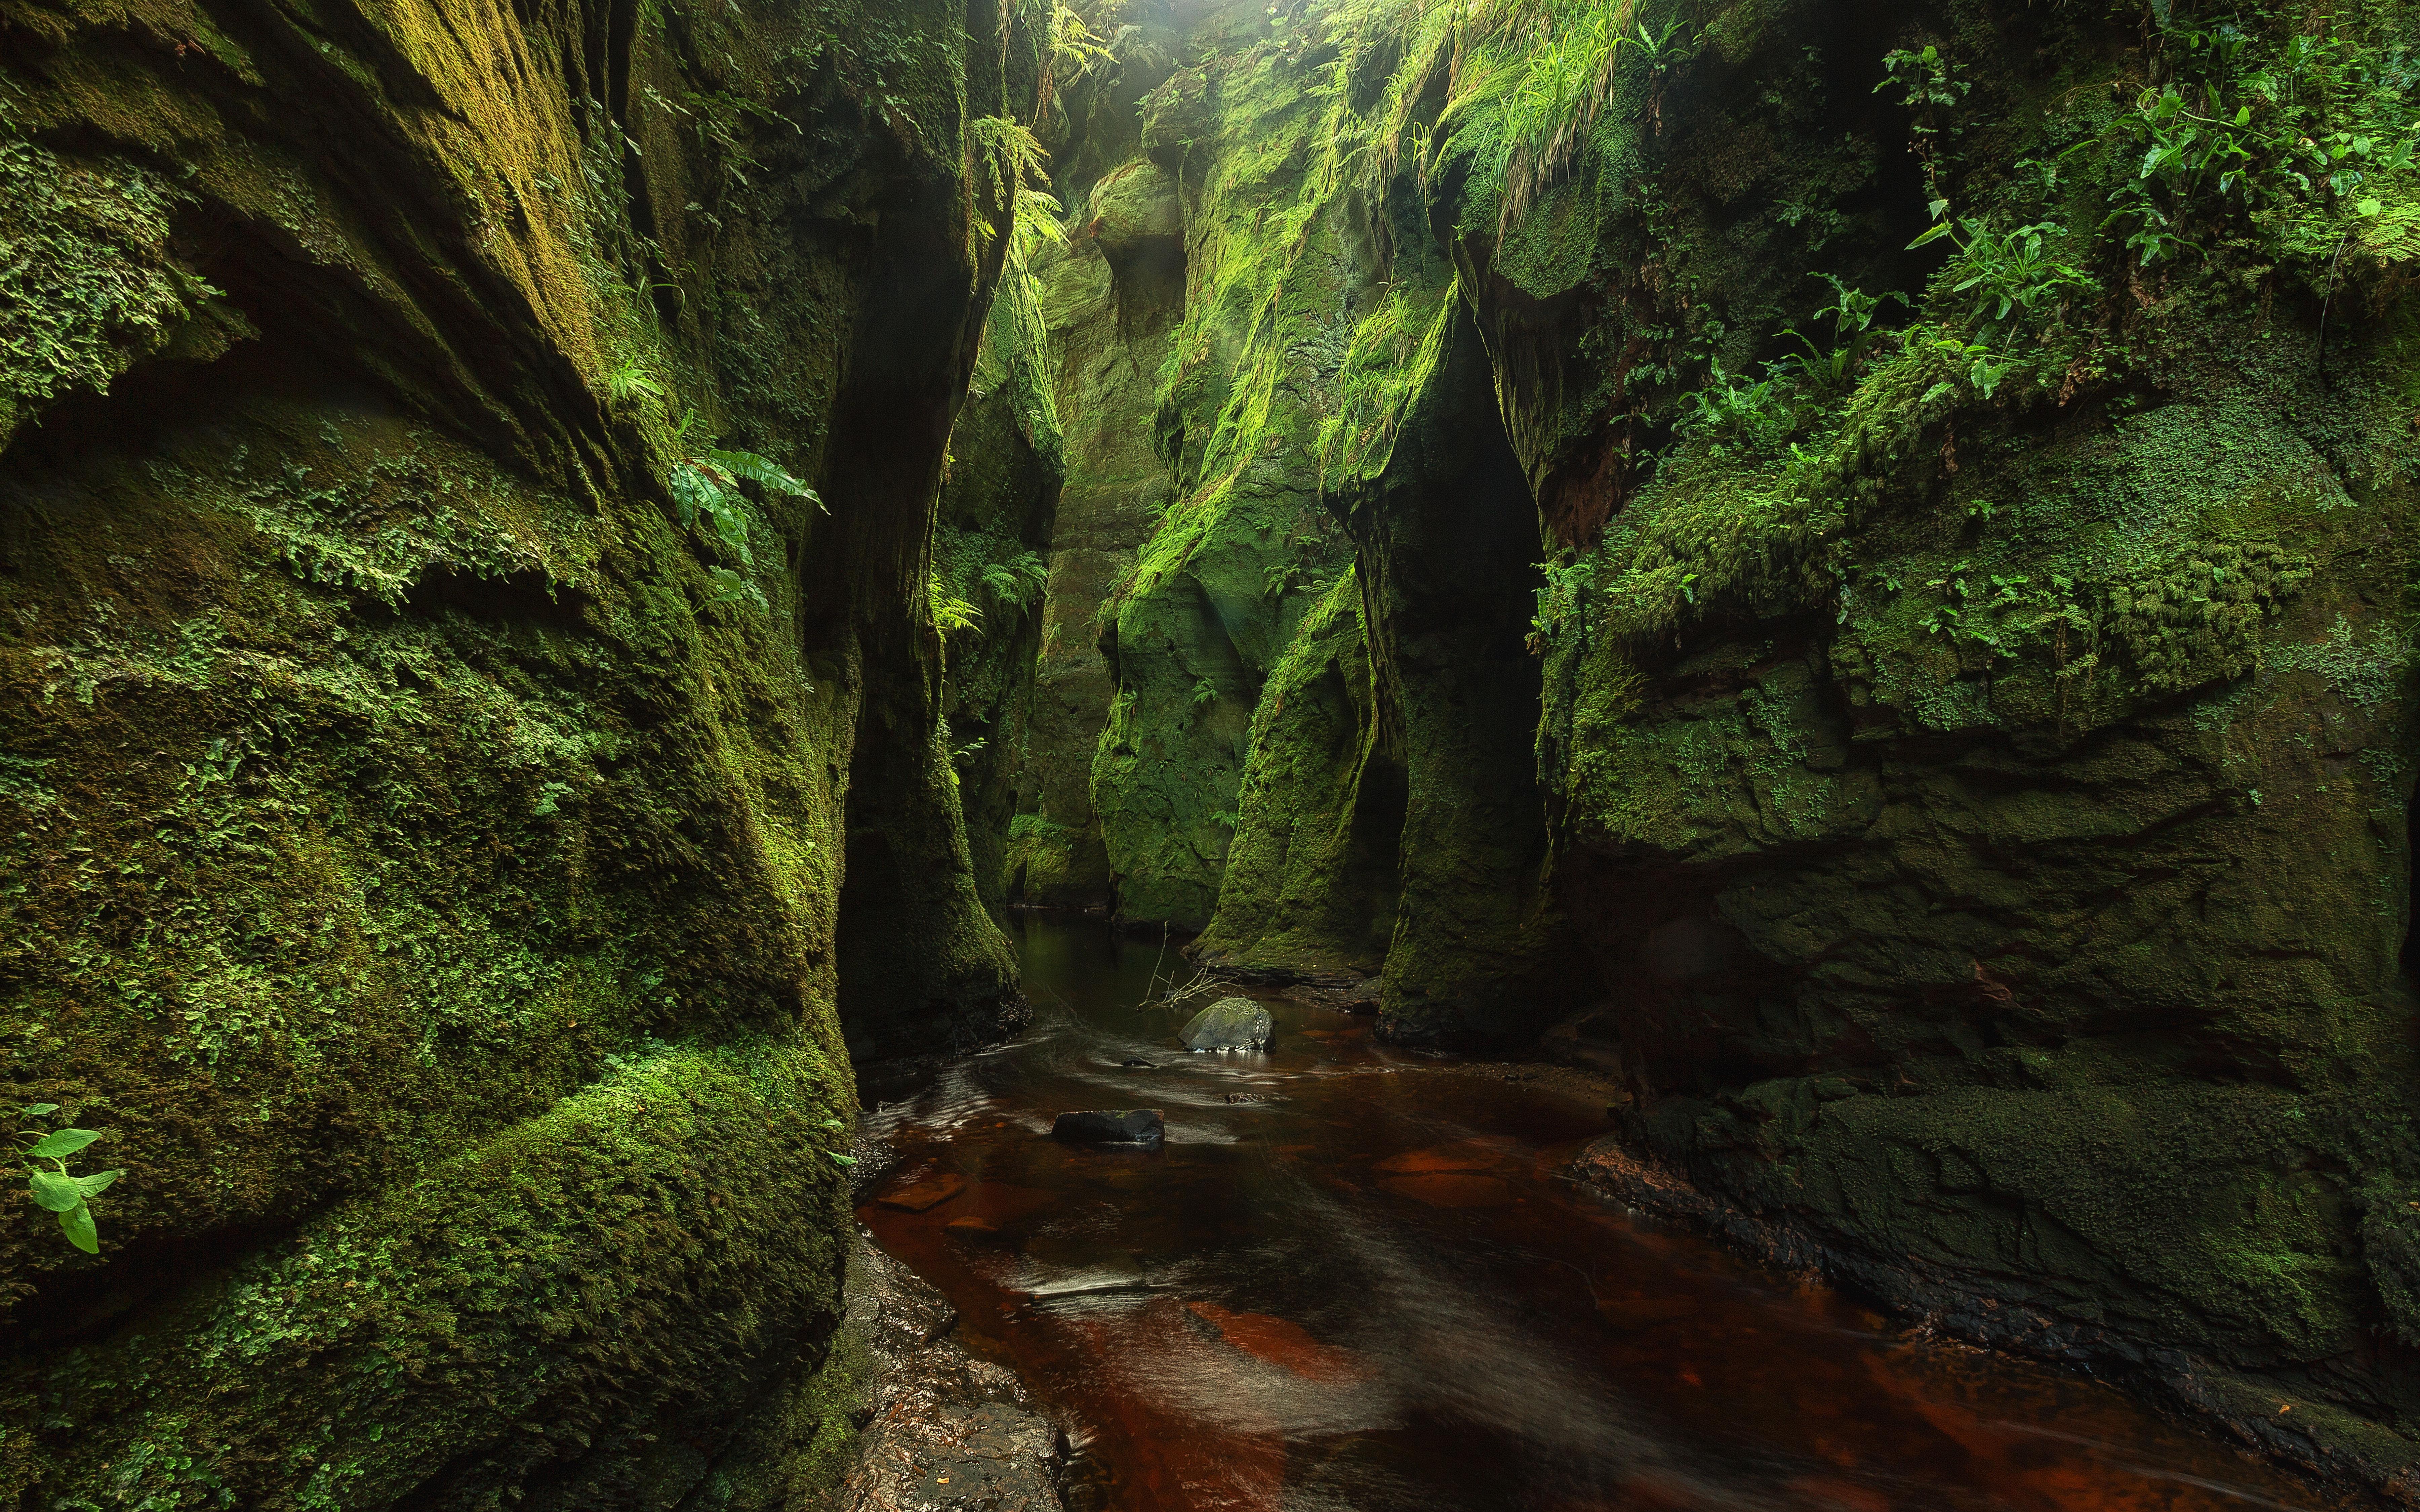 Free Images : landscape, tree, rock, waterfall, creek